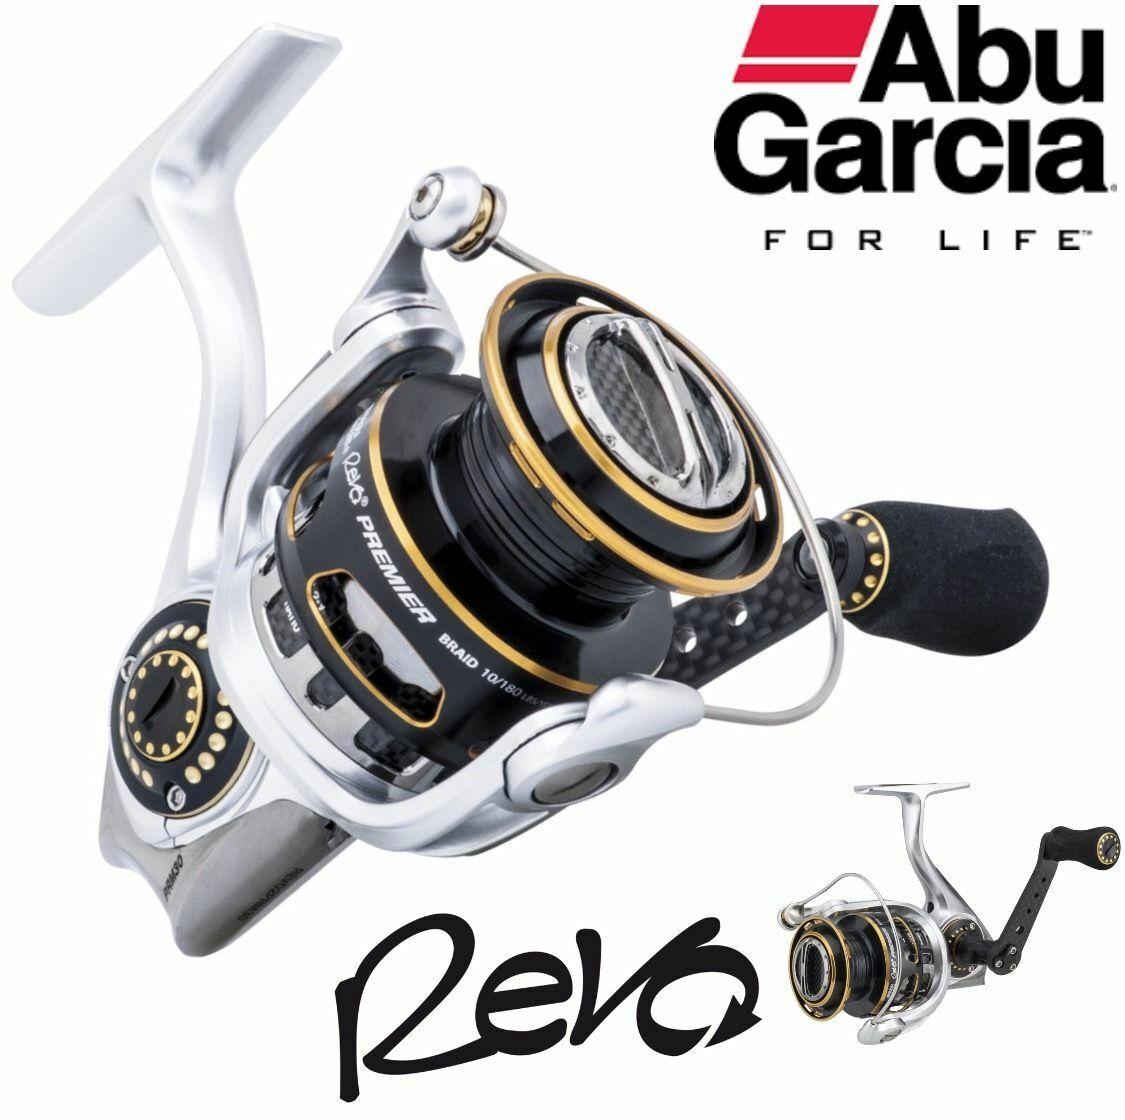 Abu Garcia Hi Perforuomoce Spinning Reel Revo Premier